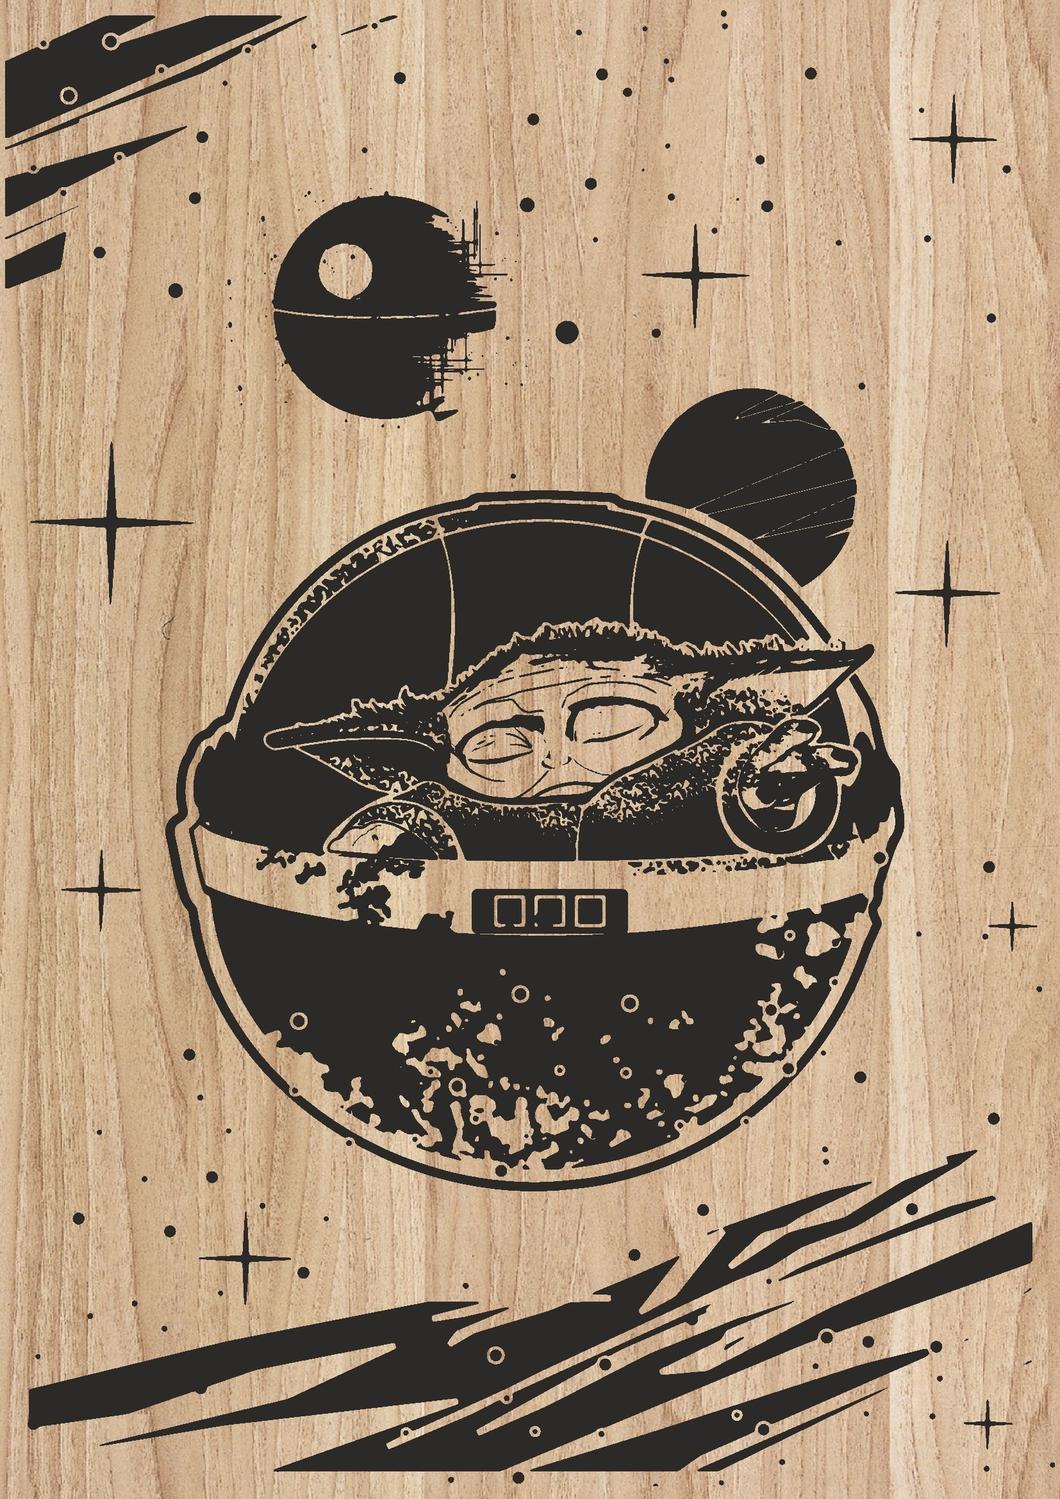 Laser Engraving Artwork Yoda Star Wars Character DXF File